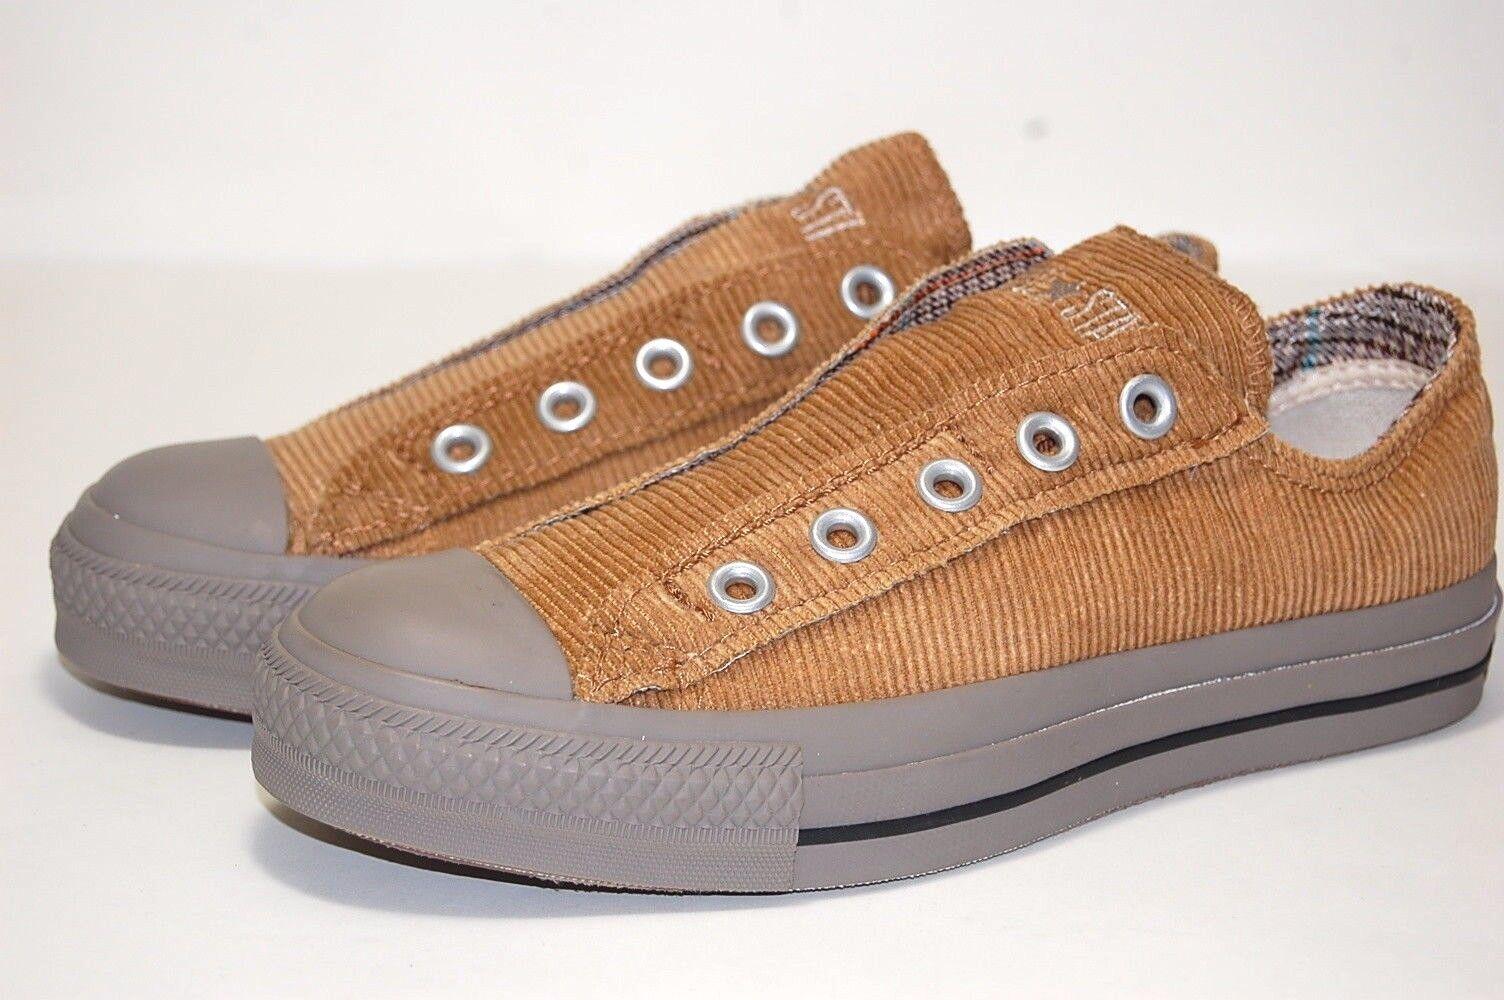 Converse Converse Converse All Star CT como Slip 1W643 Beige Zapatos para mujeres  orden en línea